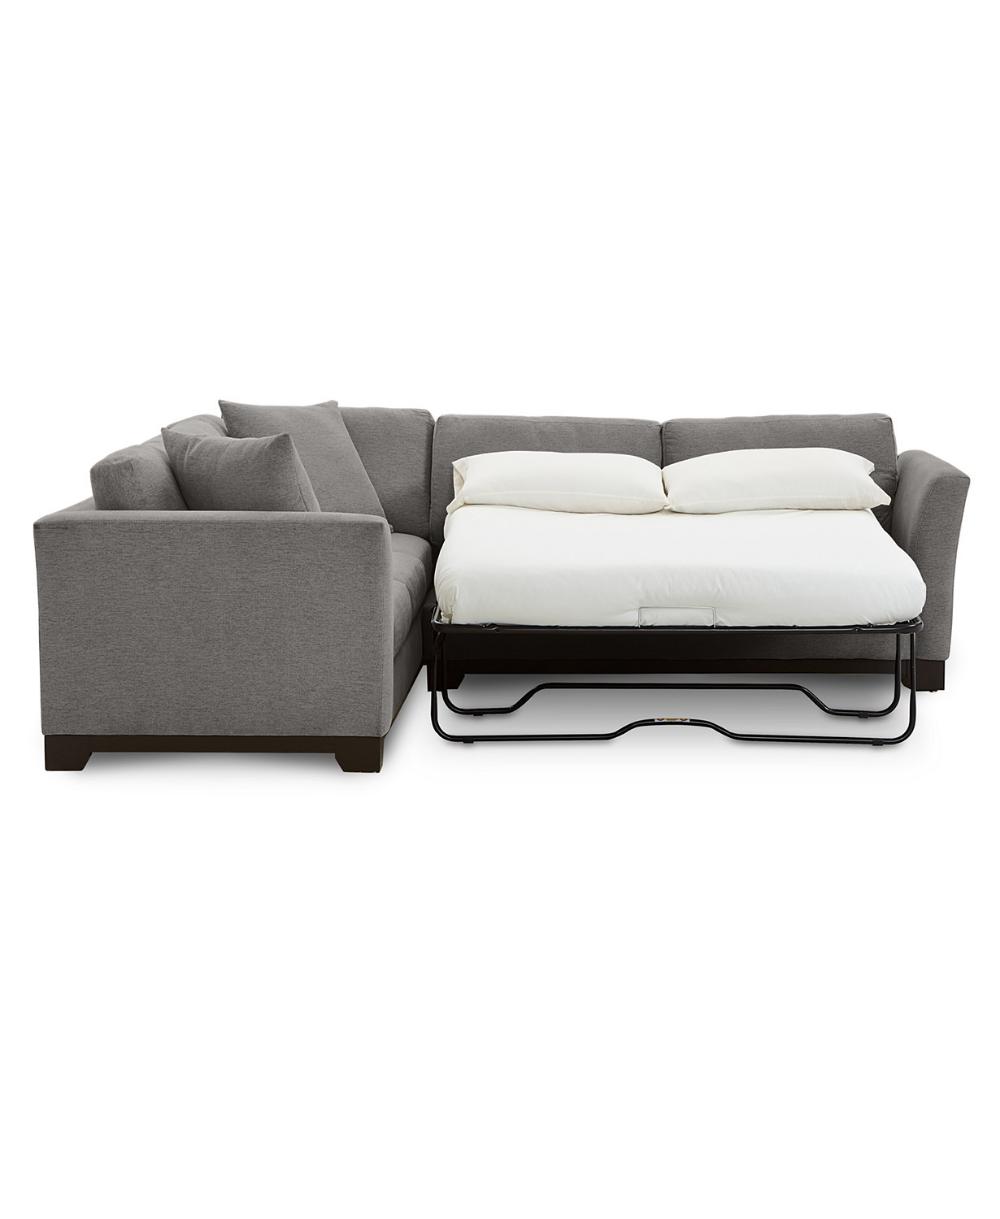 Furniture Elliot Ii 108 In 2020 Sectional Sleeper Sofa Most Comfortable Sleeper Sofa Small Space Sleeper Sofa